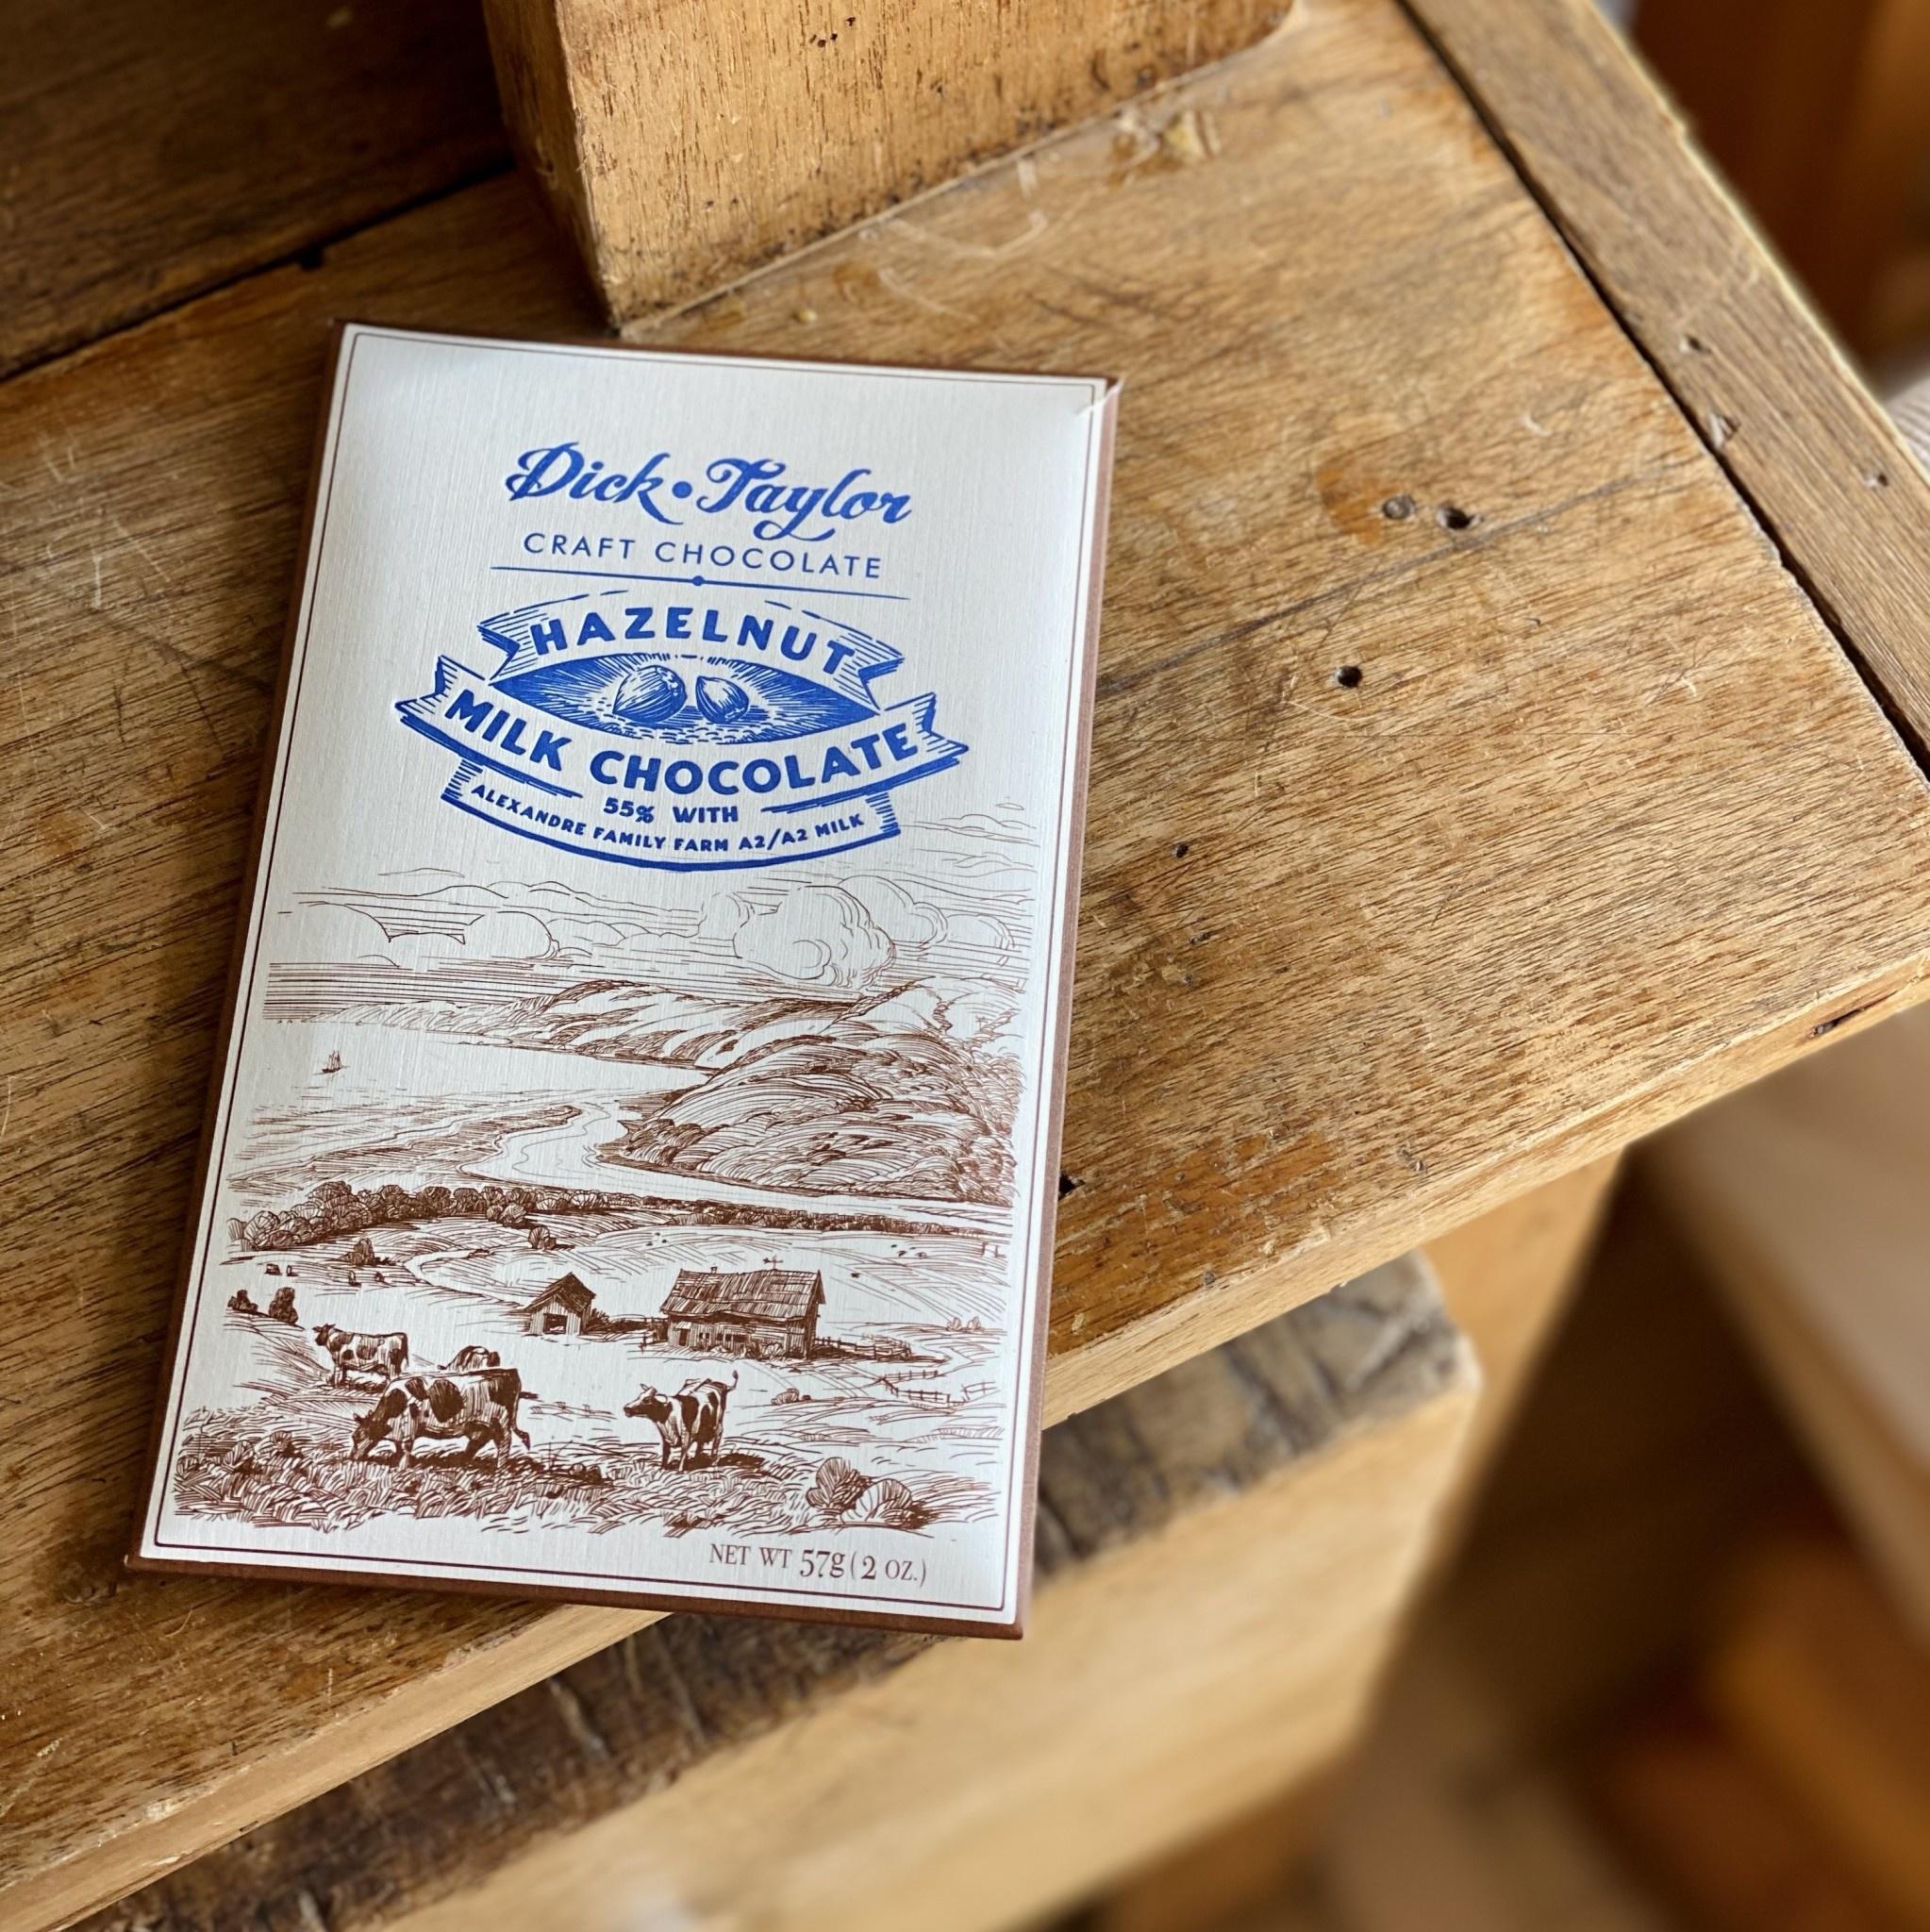 Dick Taylor Chocolate Dick Taylor Craft Chocolate - Hazelnut Milk Chocolate